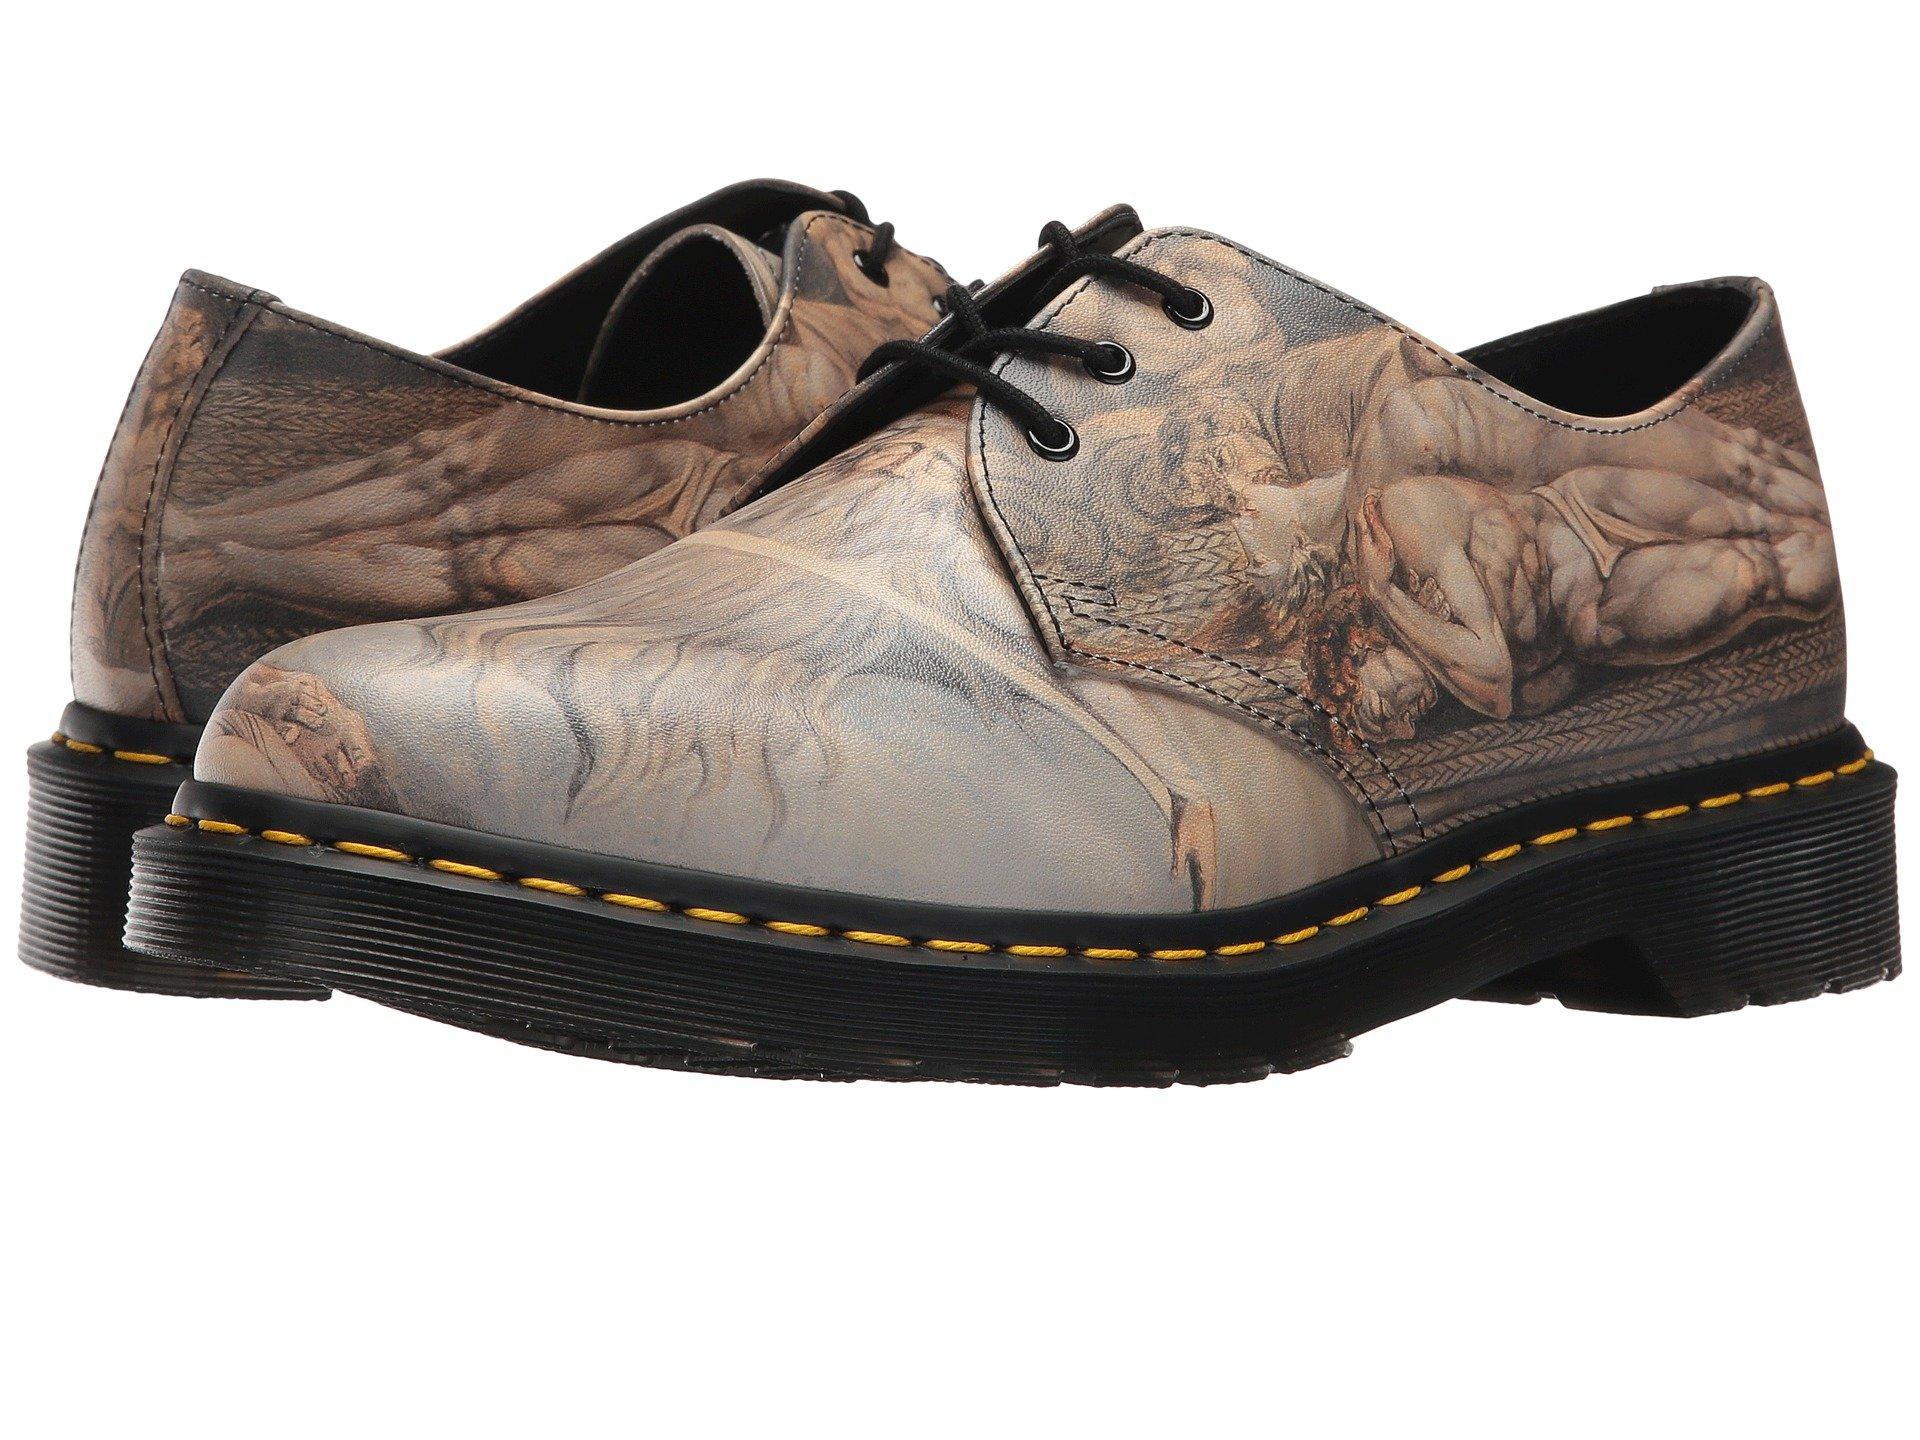 Dr. Martens William Blake 1461 3-Eye Shoe